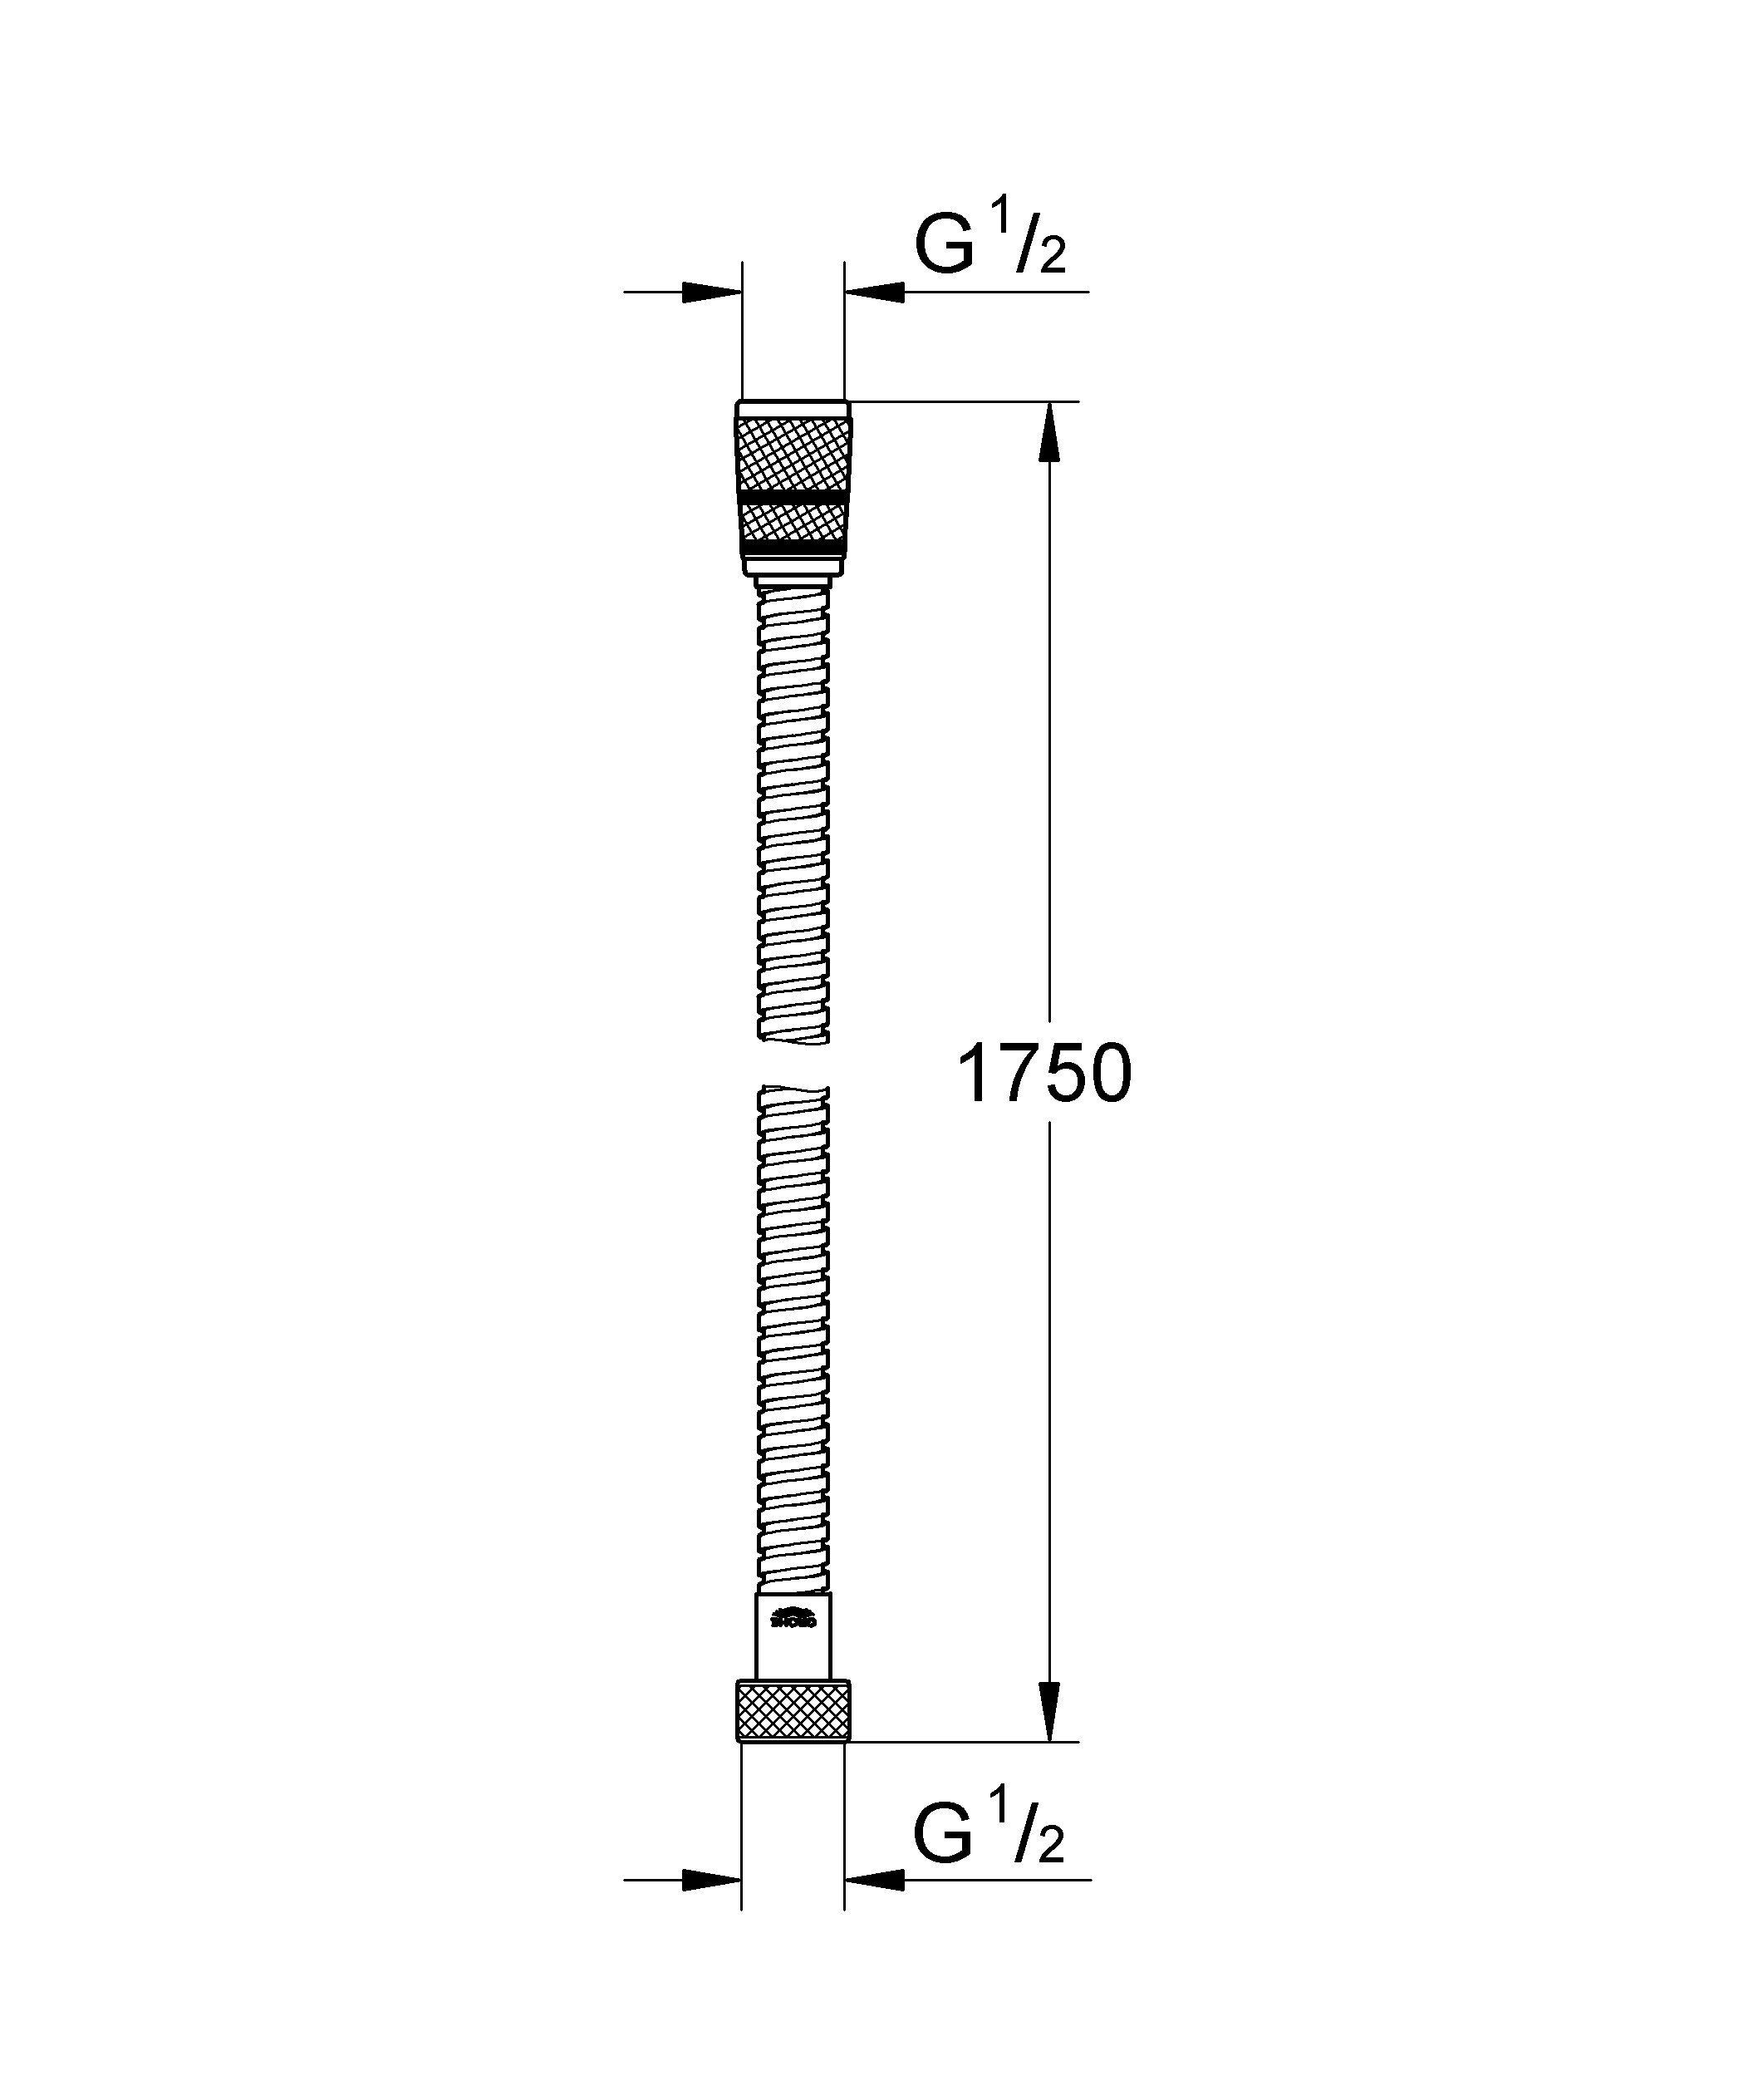 Rotaflex Metallic Hose by GROHE (Image #2)